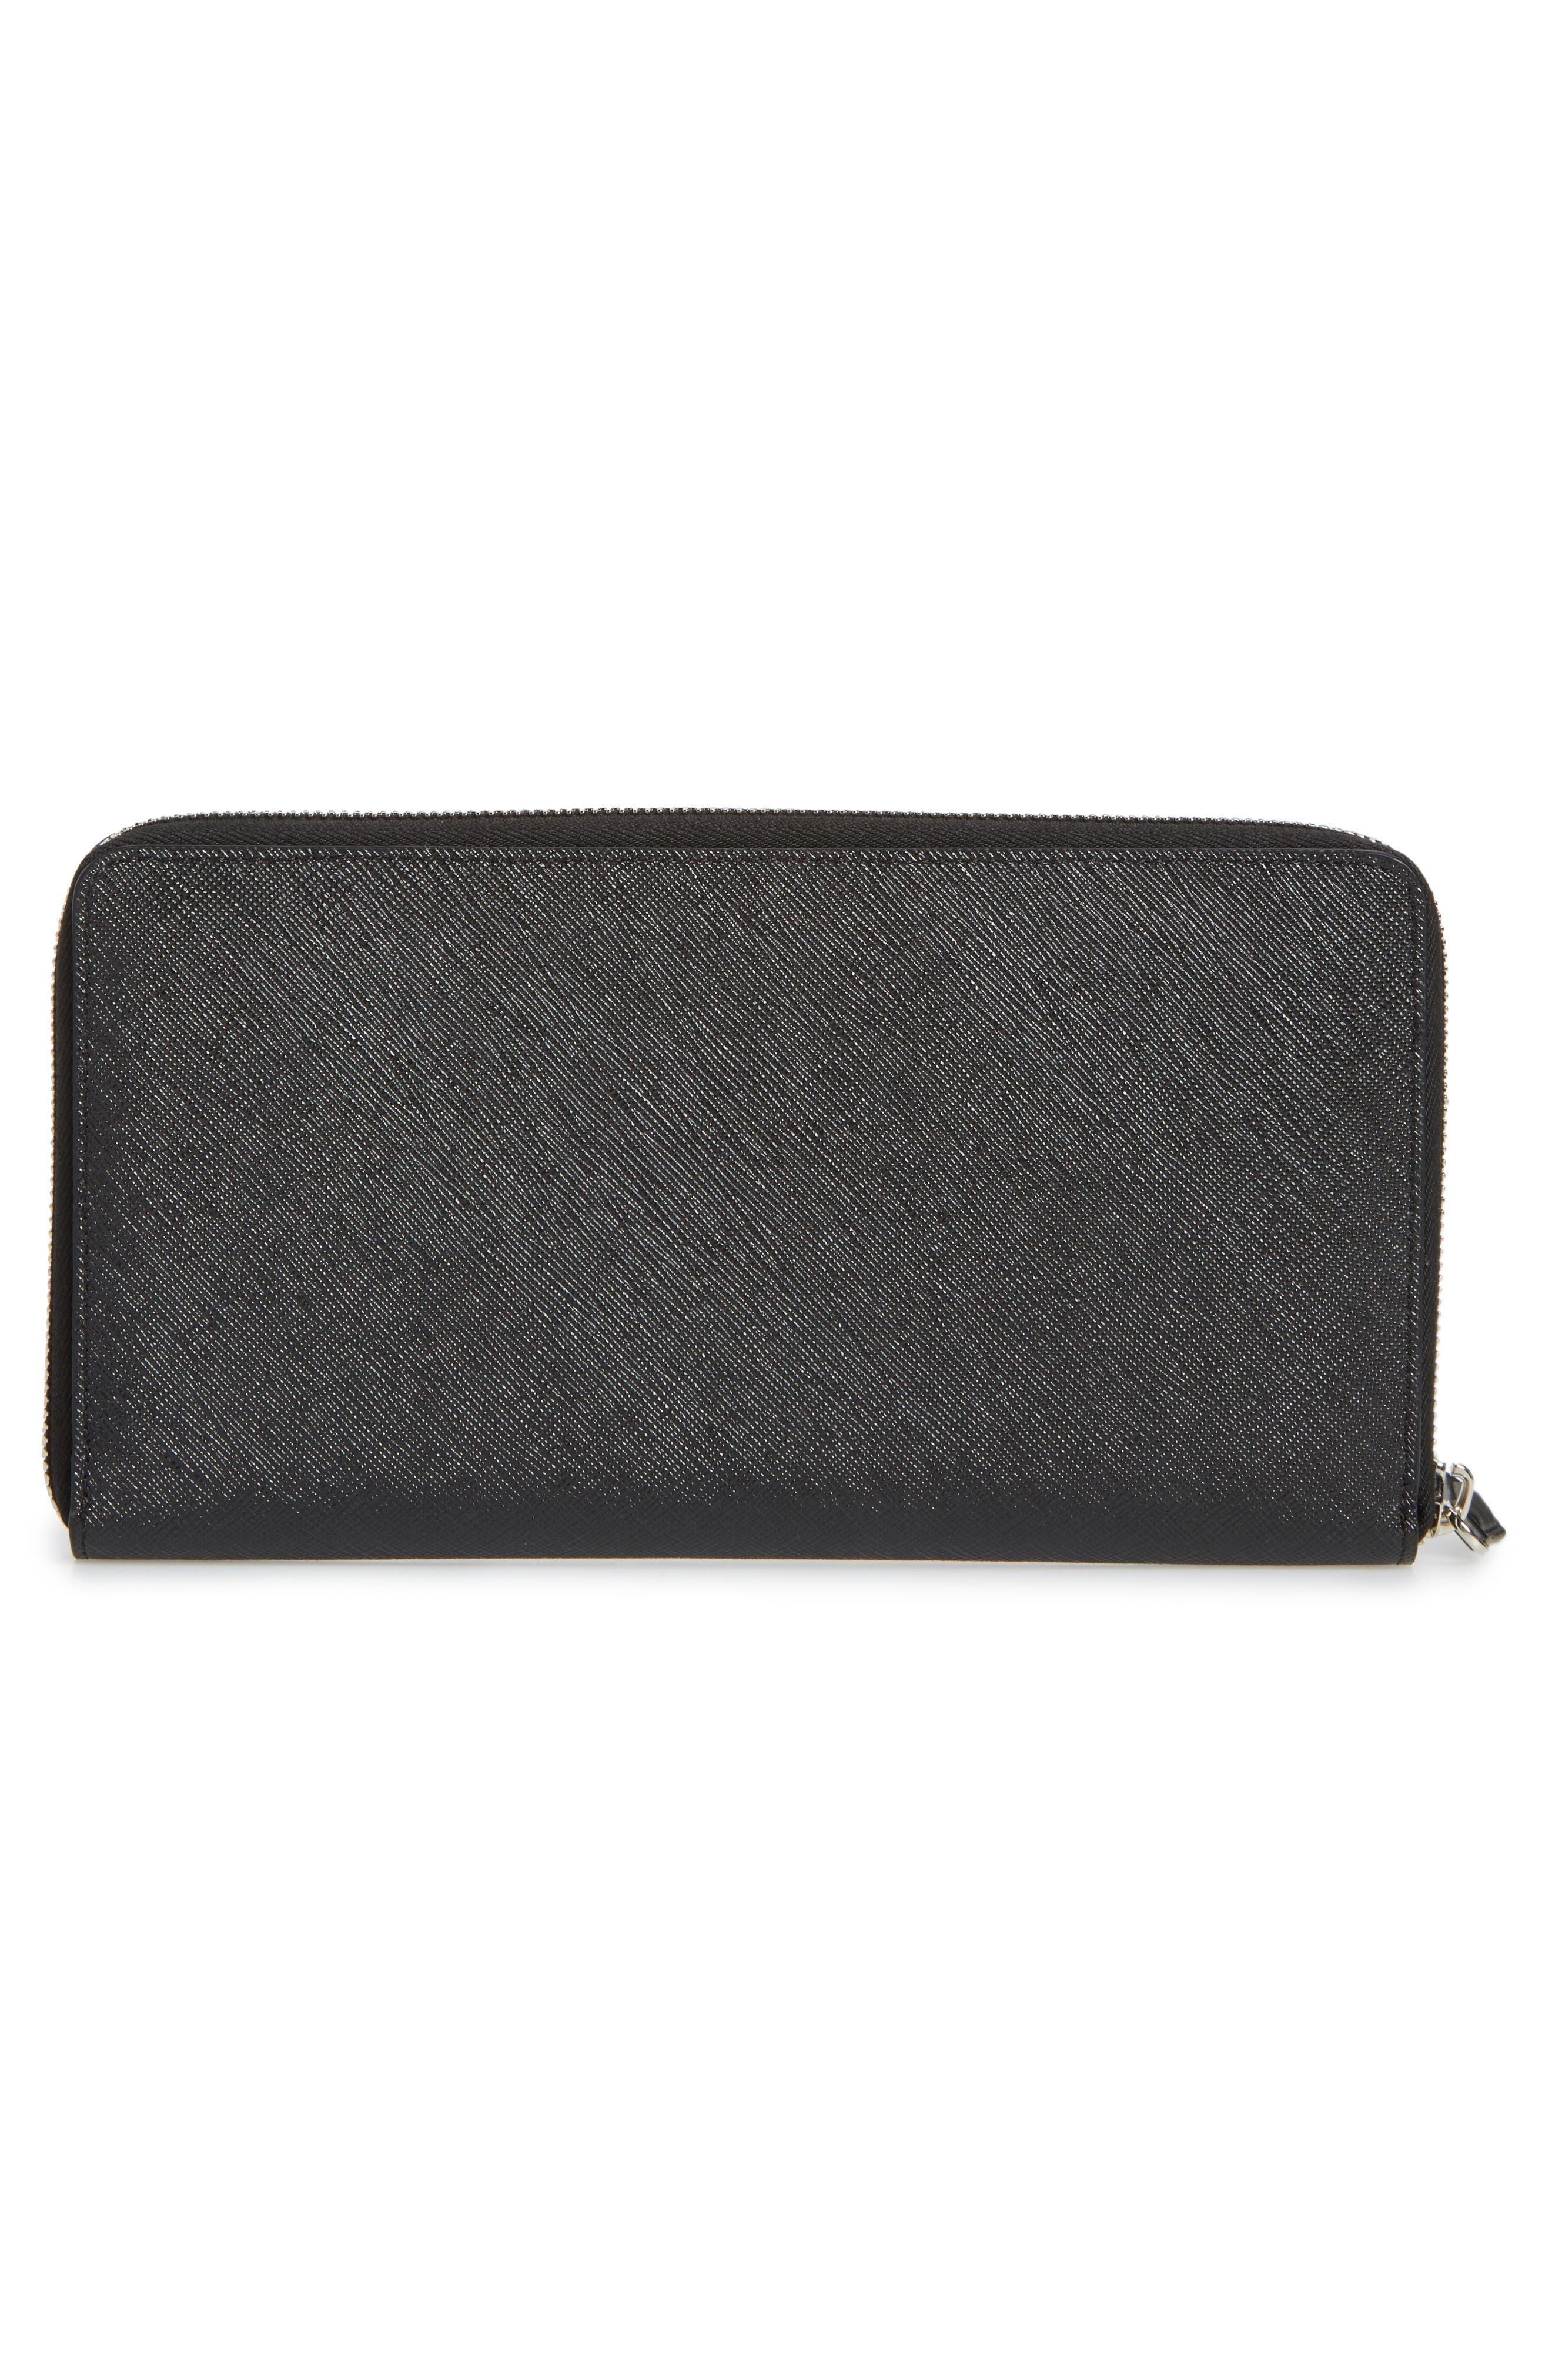 Alternate Image 3  - Givenchy Jaguar Zip-Around Wallet